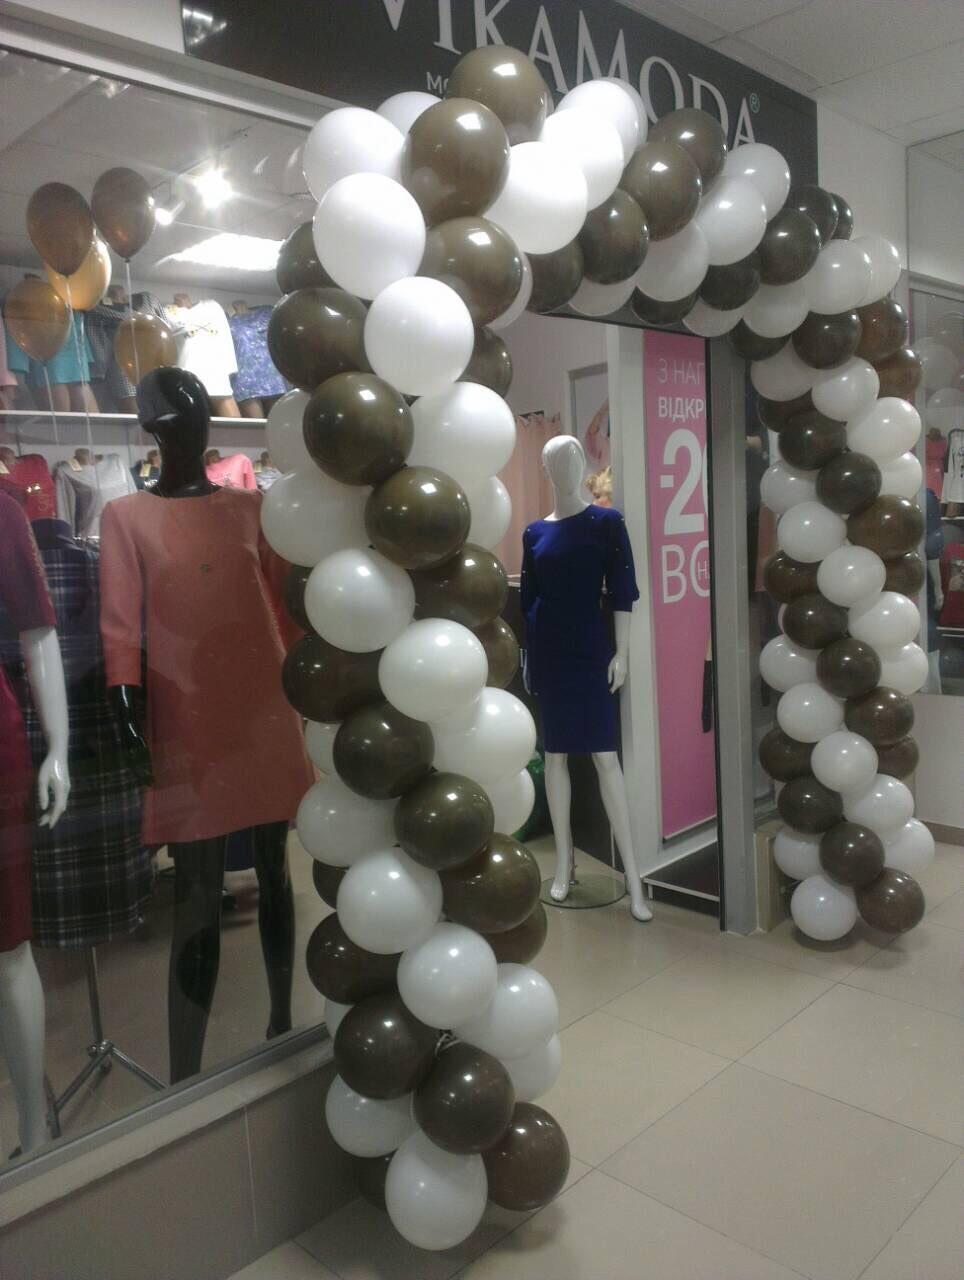 Магазин VIKAMODA в г. Тернополь